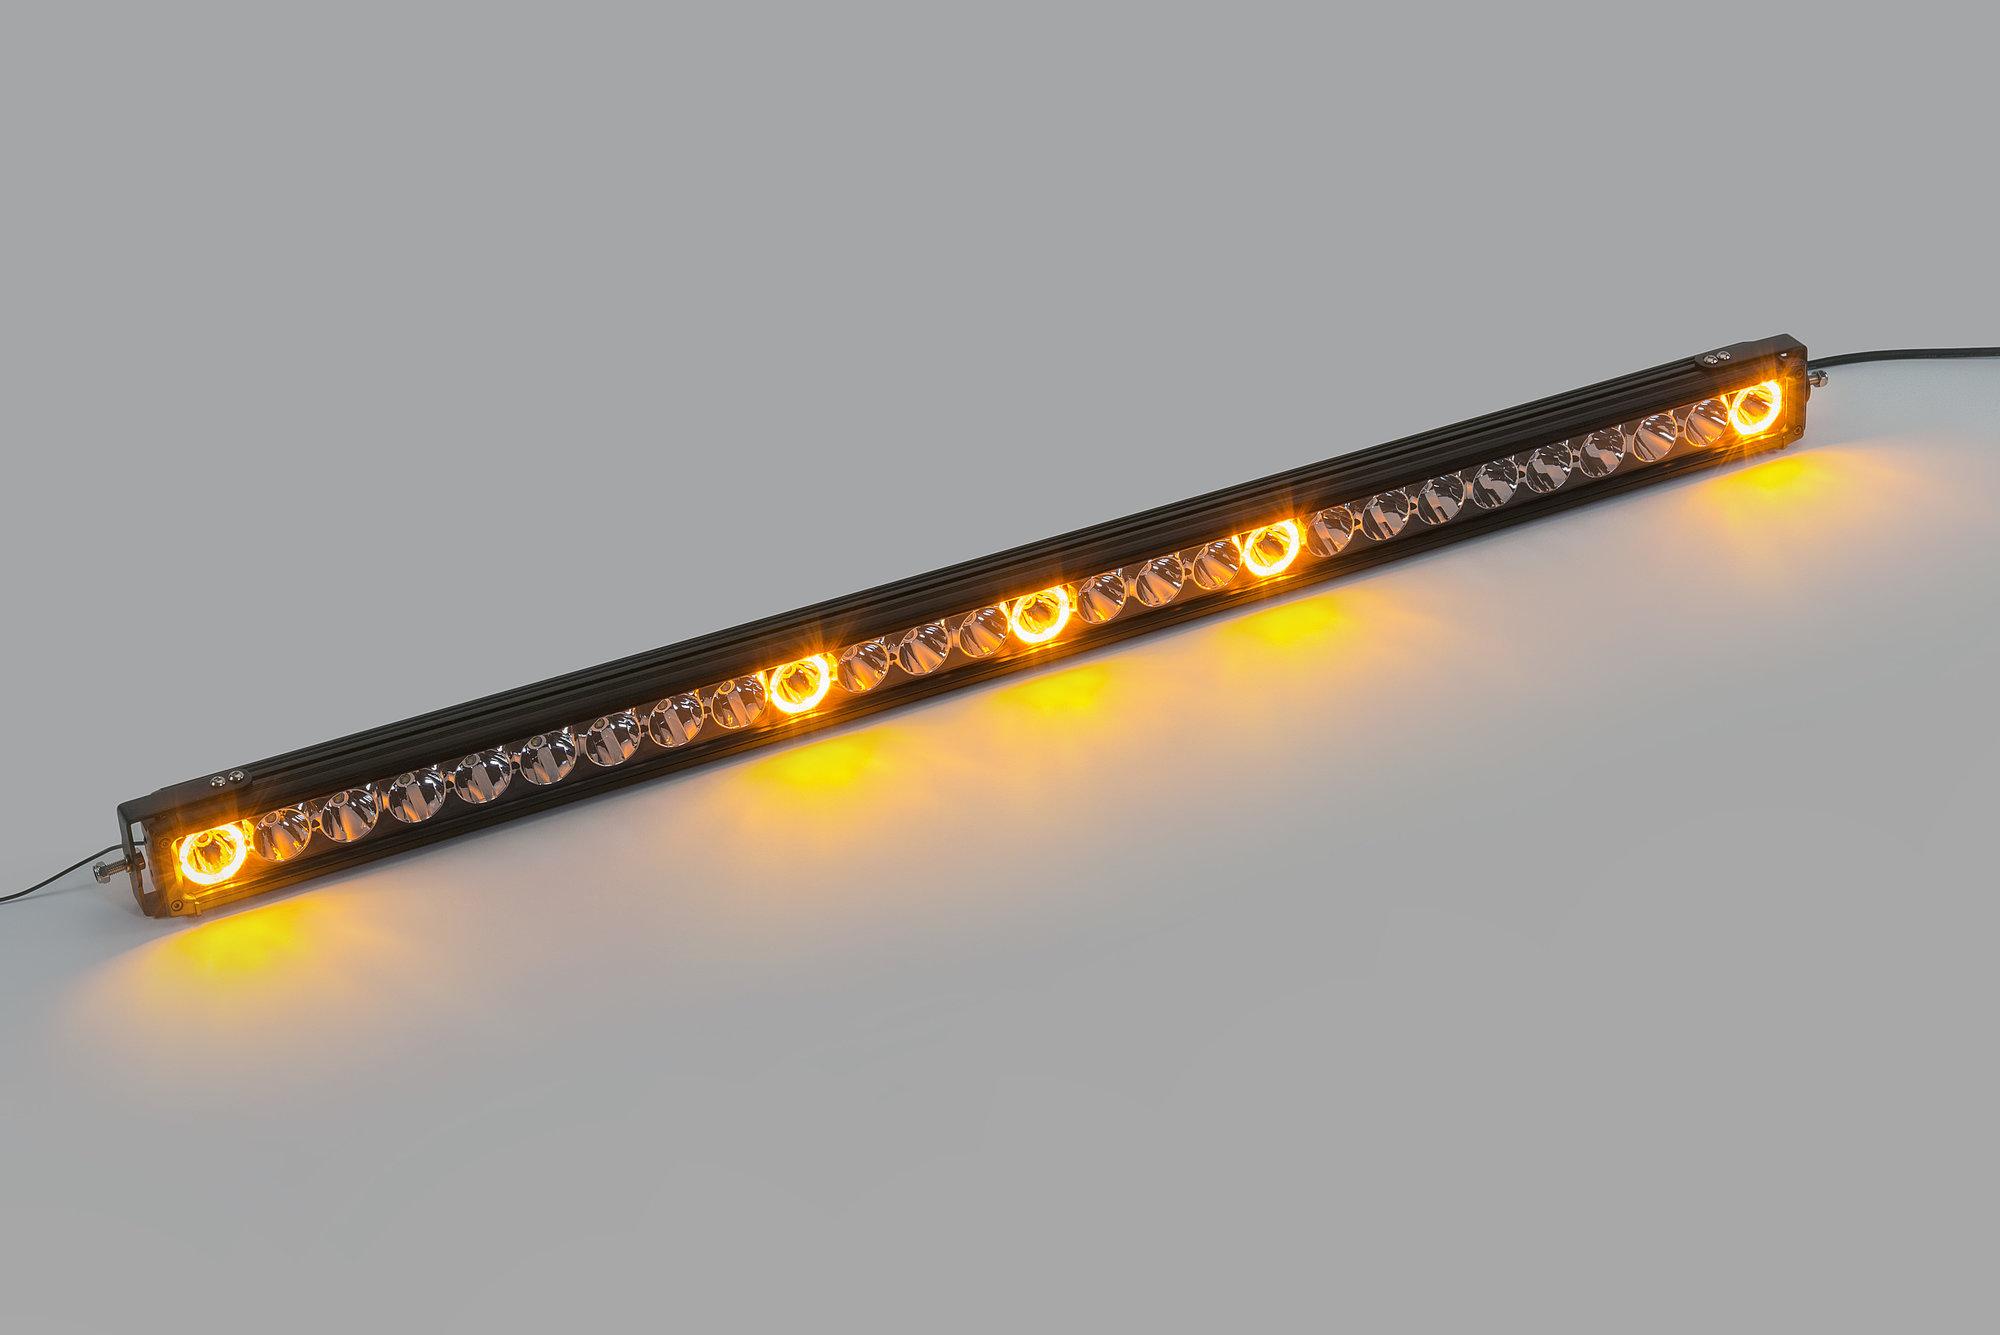 Quadratec J5 Led Light Bar With Amber Clearance Cab Lights